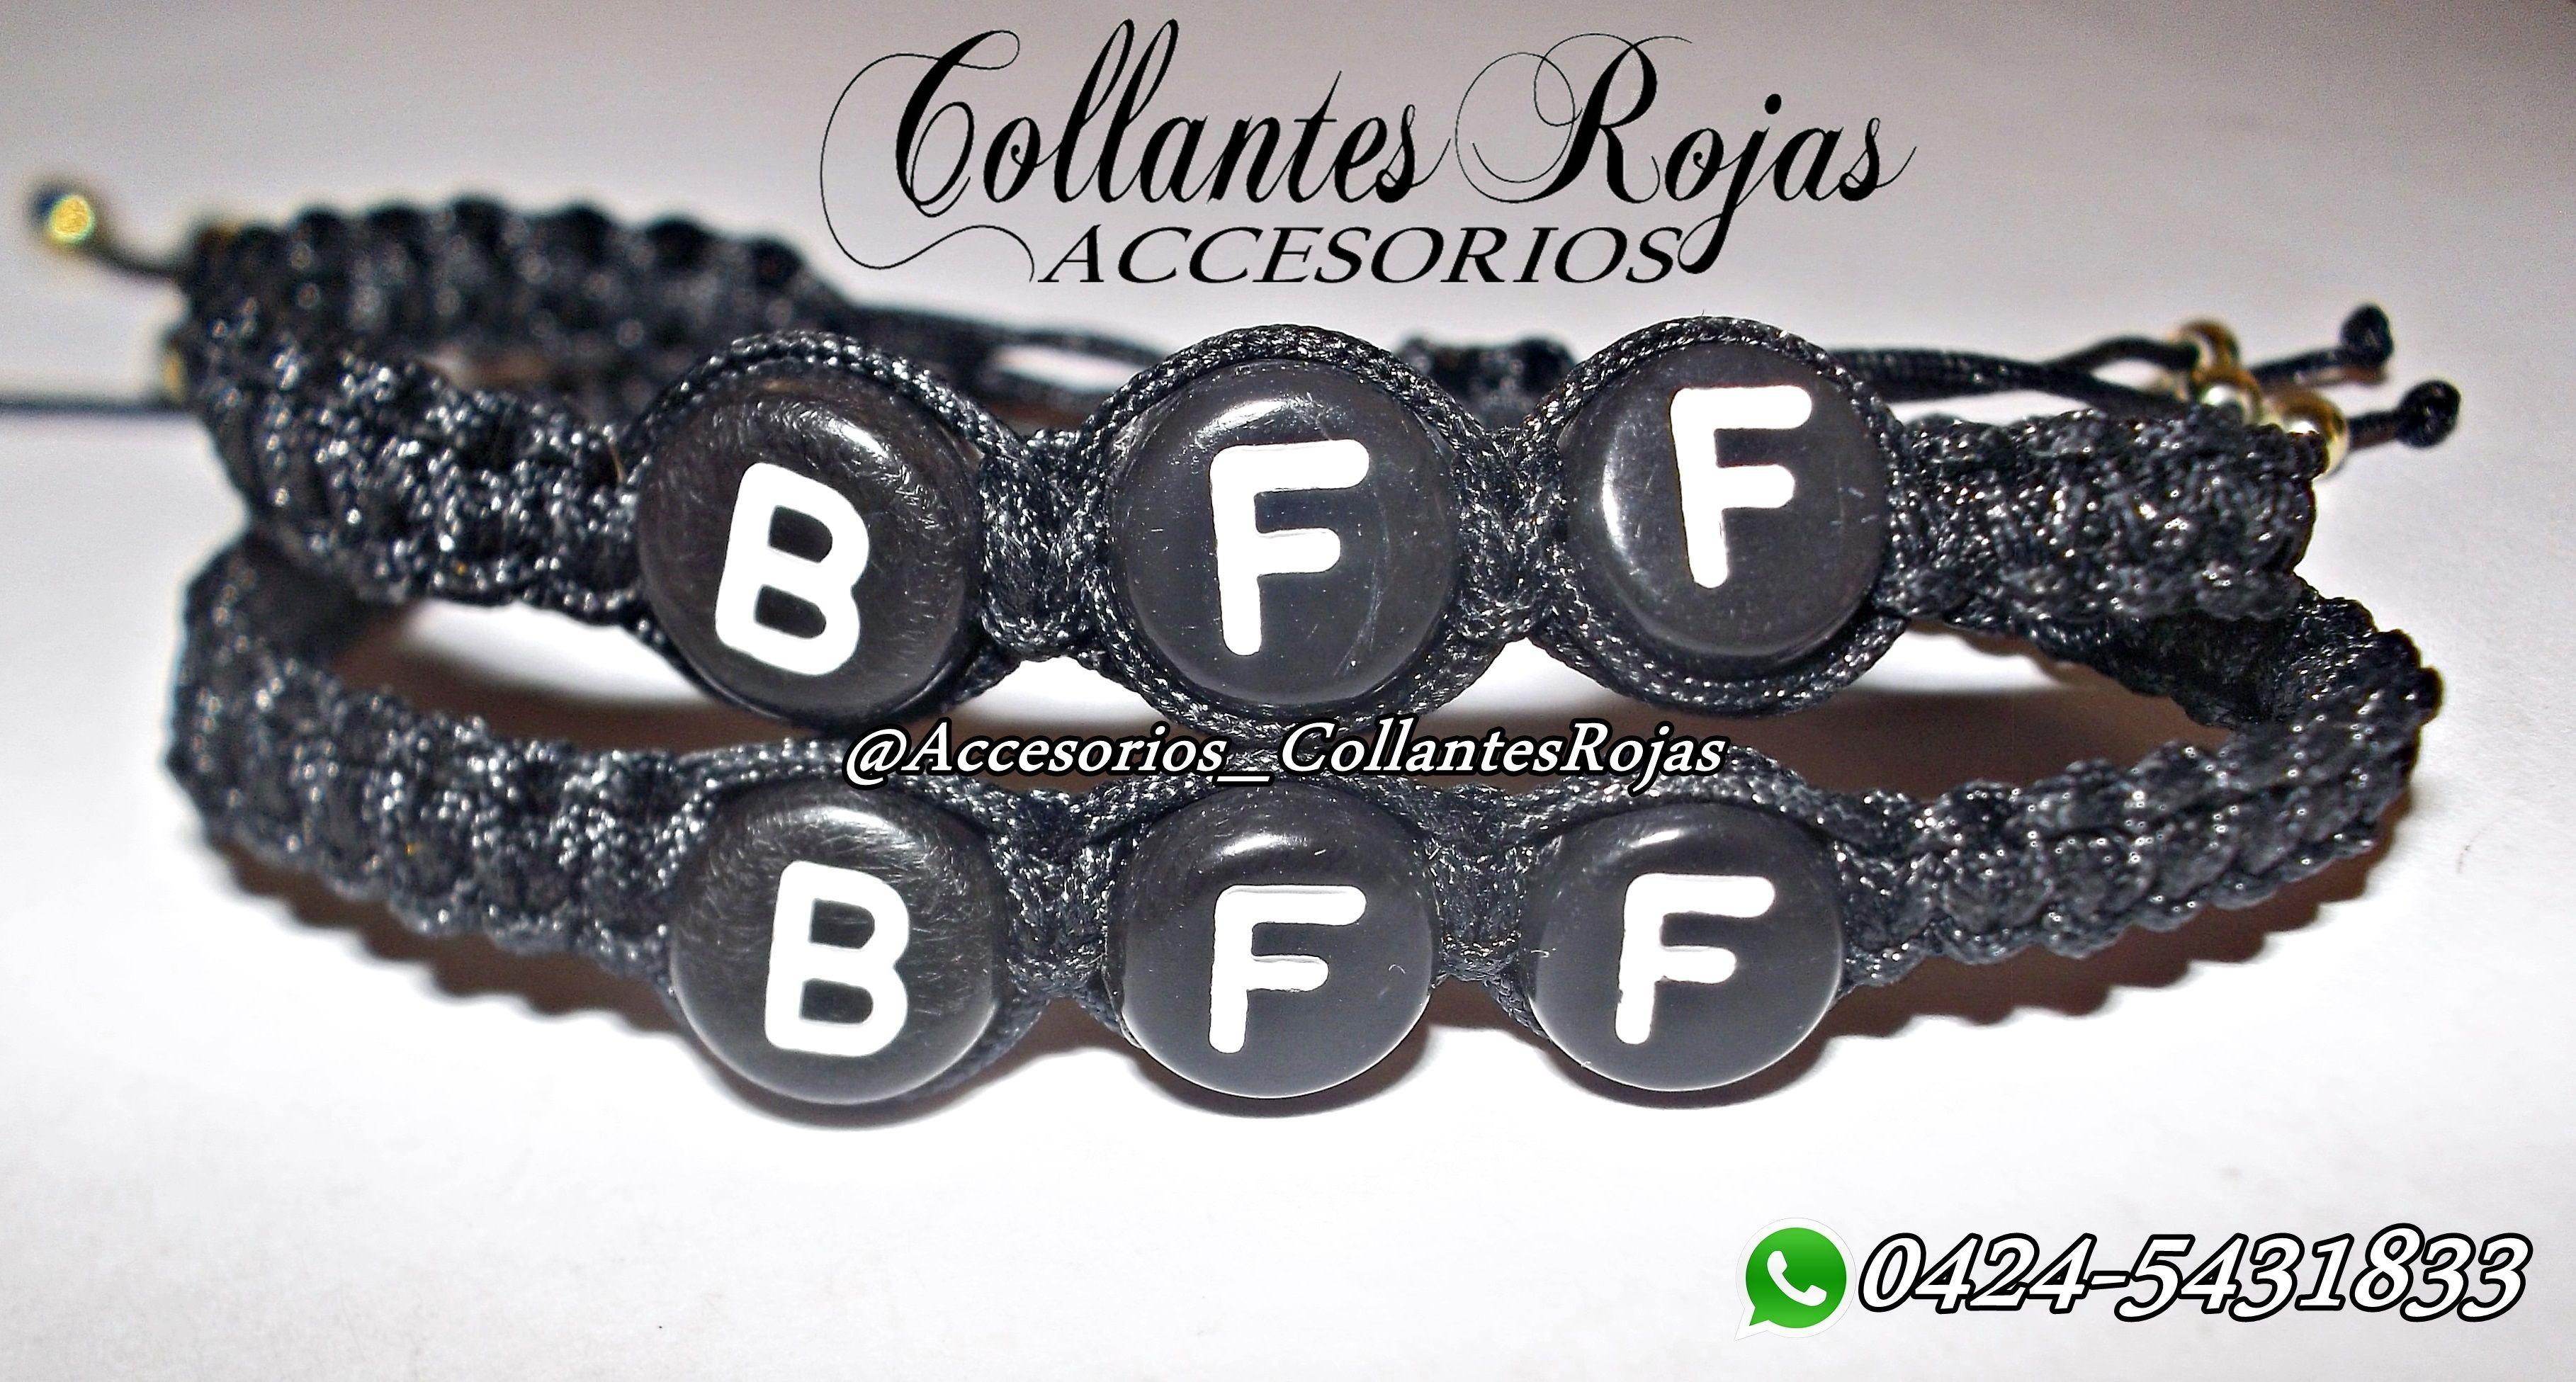 a0412902a5cc Instagram   Accesorios CollantesRojas Whatsapp  +58 4245431833 Pulseras  tejidas  pulseras  accesorios